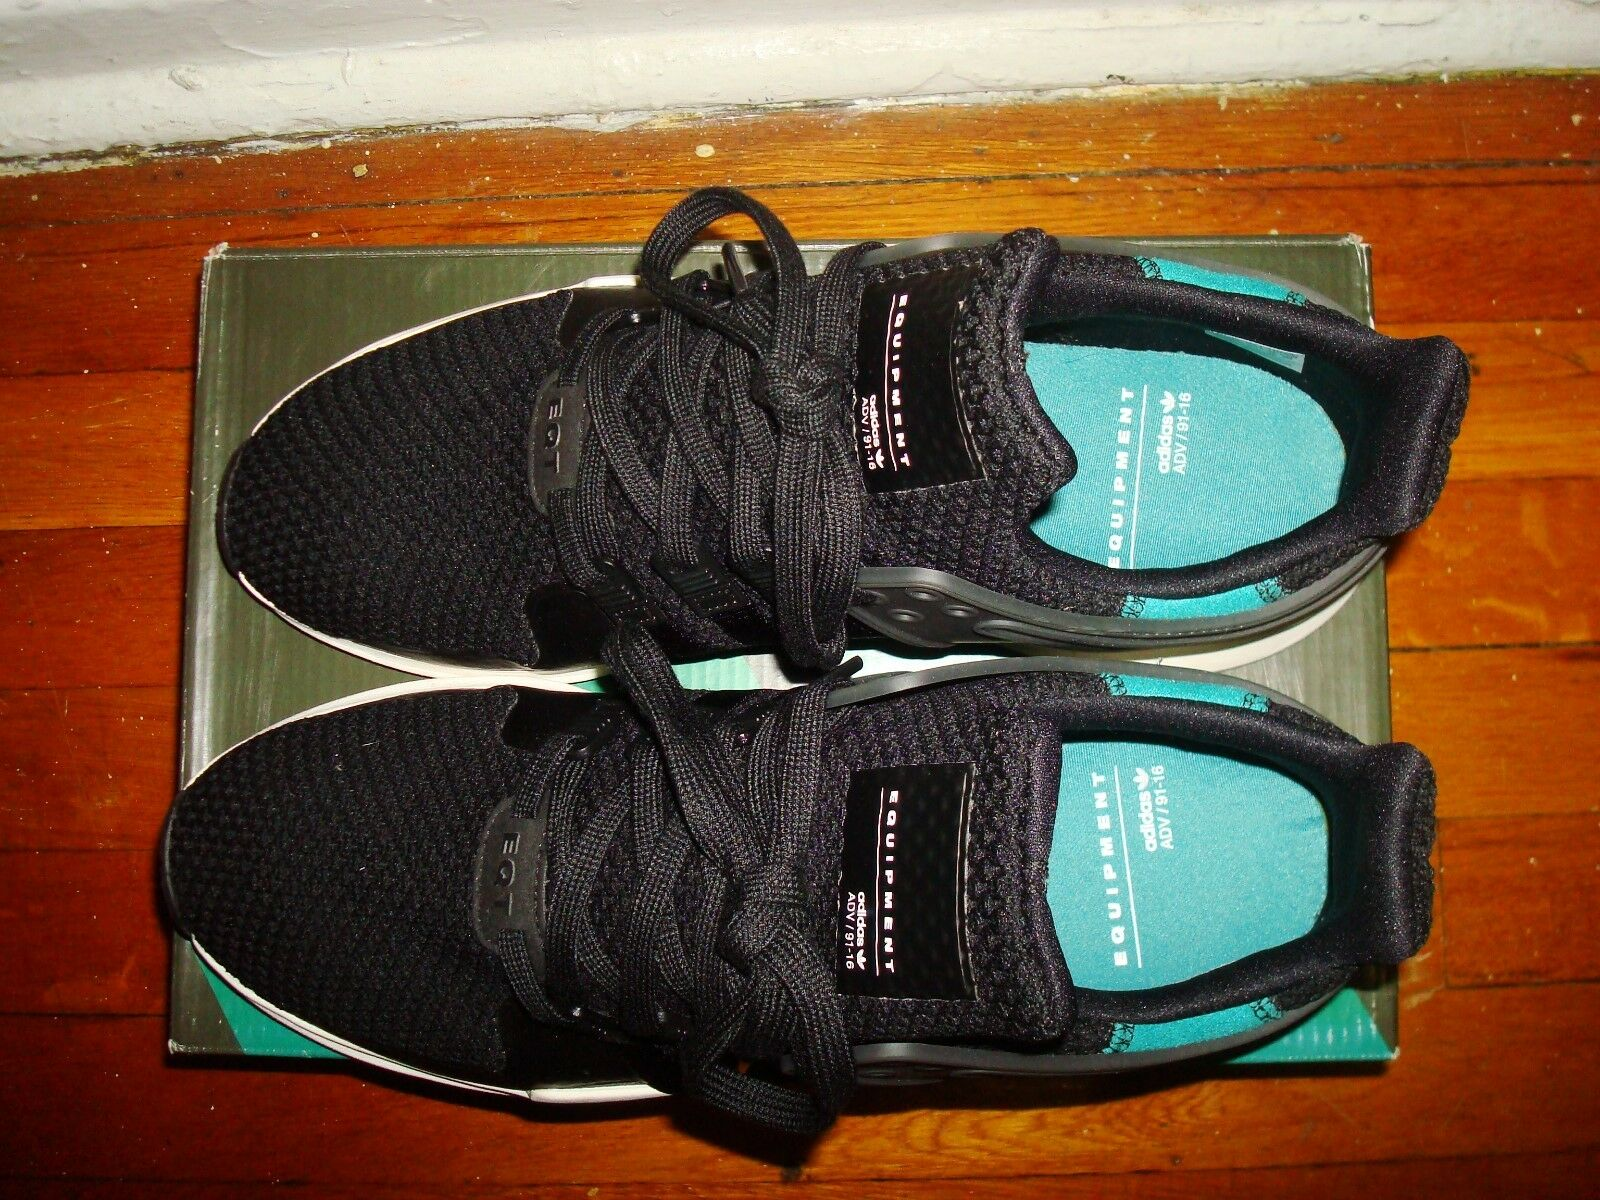 Adidas Equipment Support ADV scarpe da ginnastica    US11  nero-verde-bianca  BA8323 ccd0e8